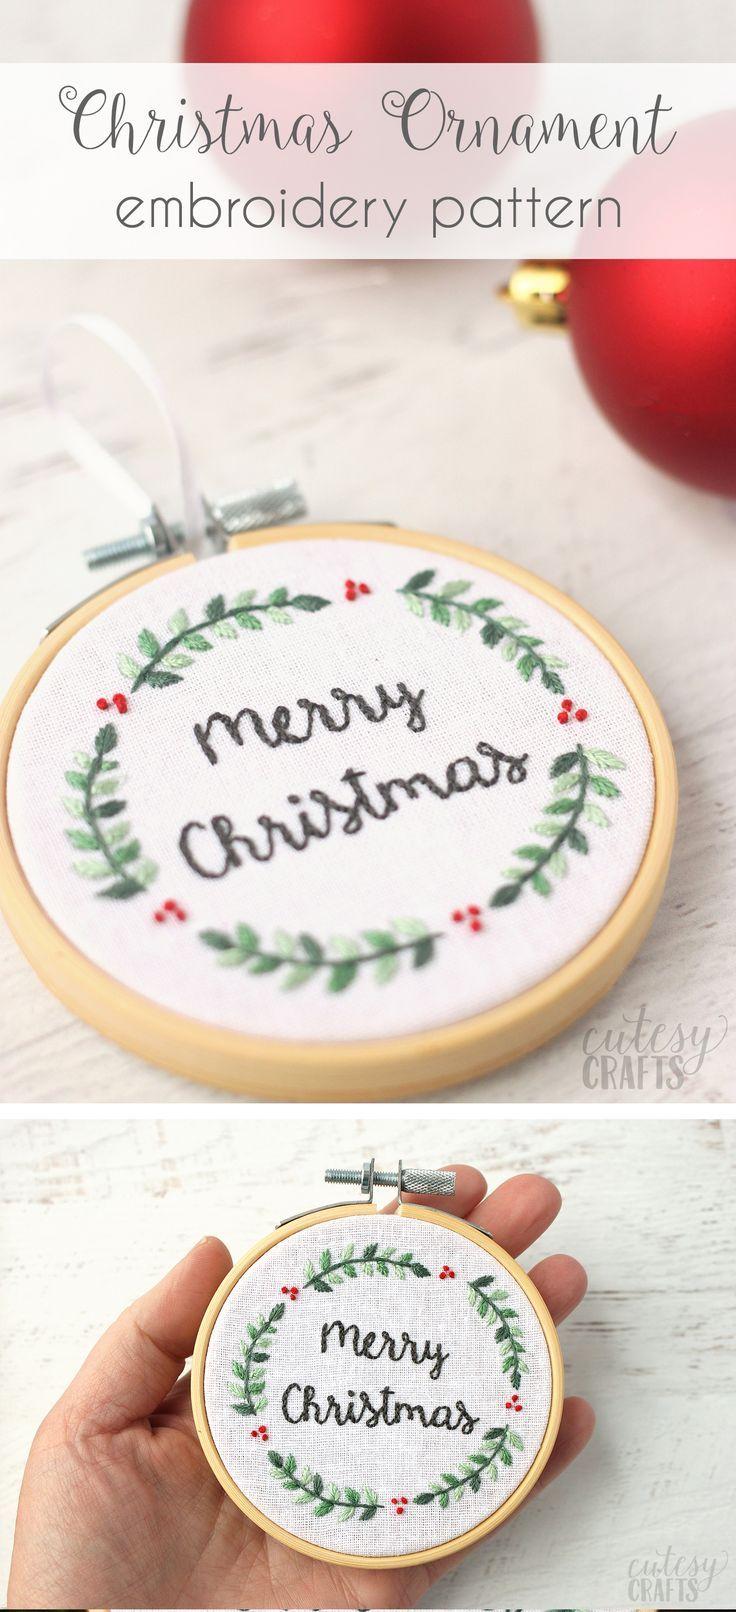 Merry Christmas Ornament Tutorial Free Christmas Embroidery Designs Christmas Embroidery Designs Christmas Embroidery Patterns Embroidery Hoop Crafts